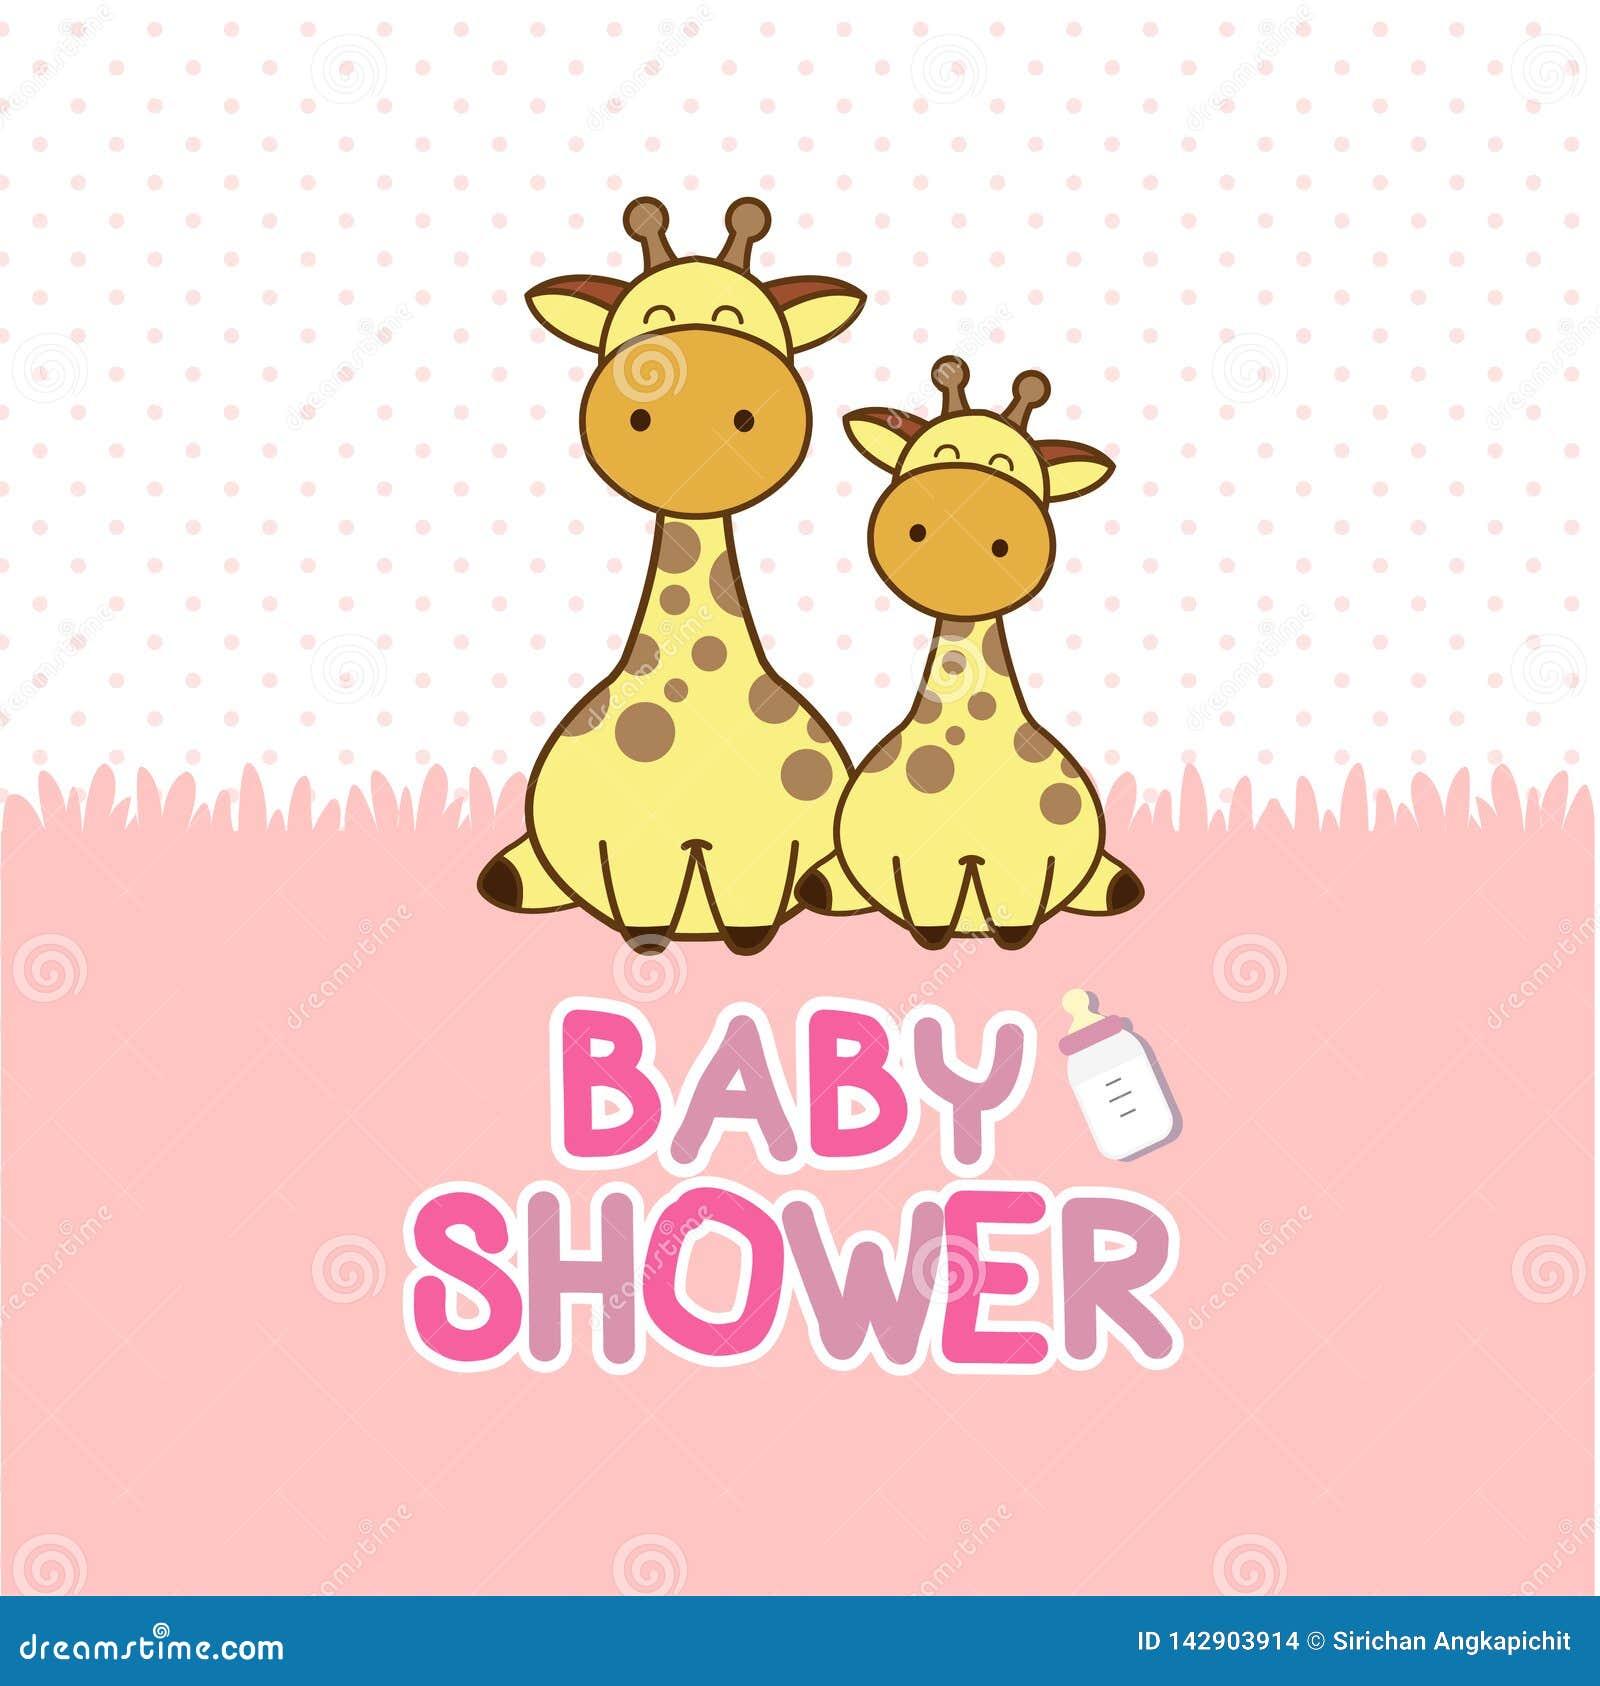 Baby shower invitation card. Baby Giraffe cartoon.